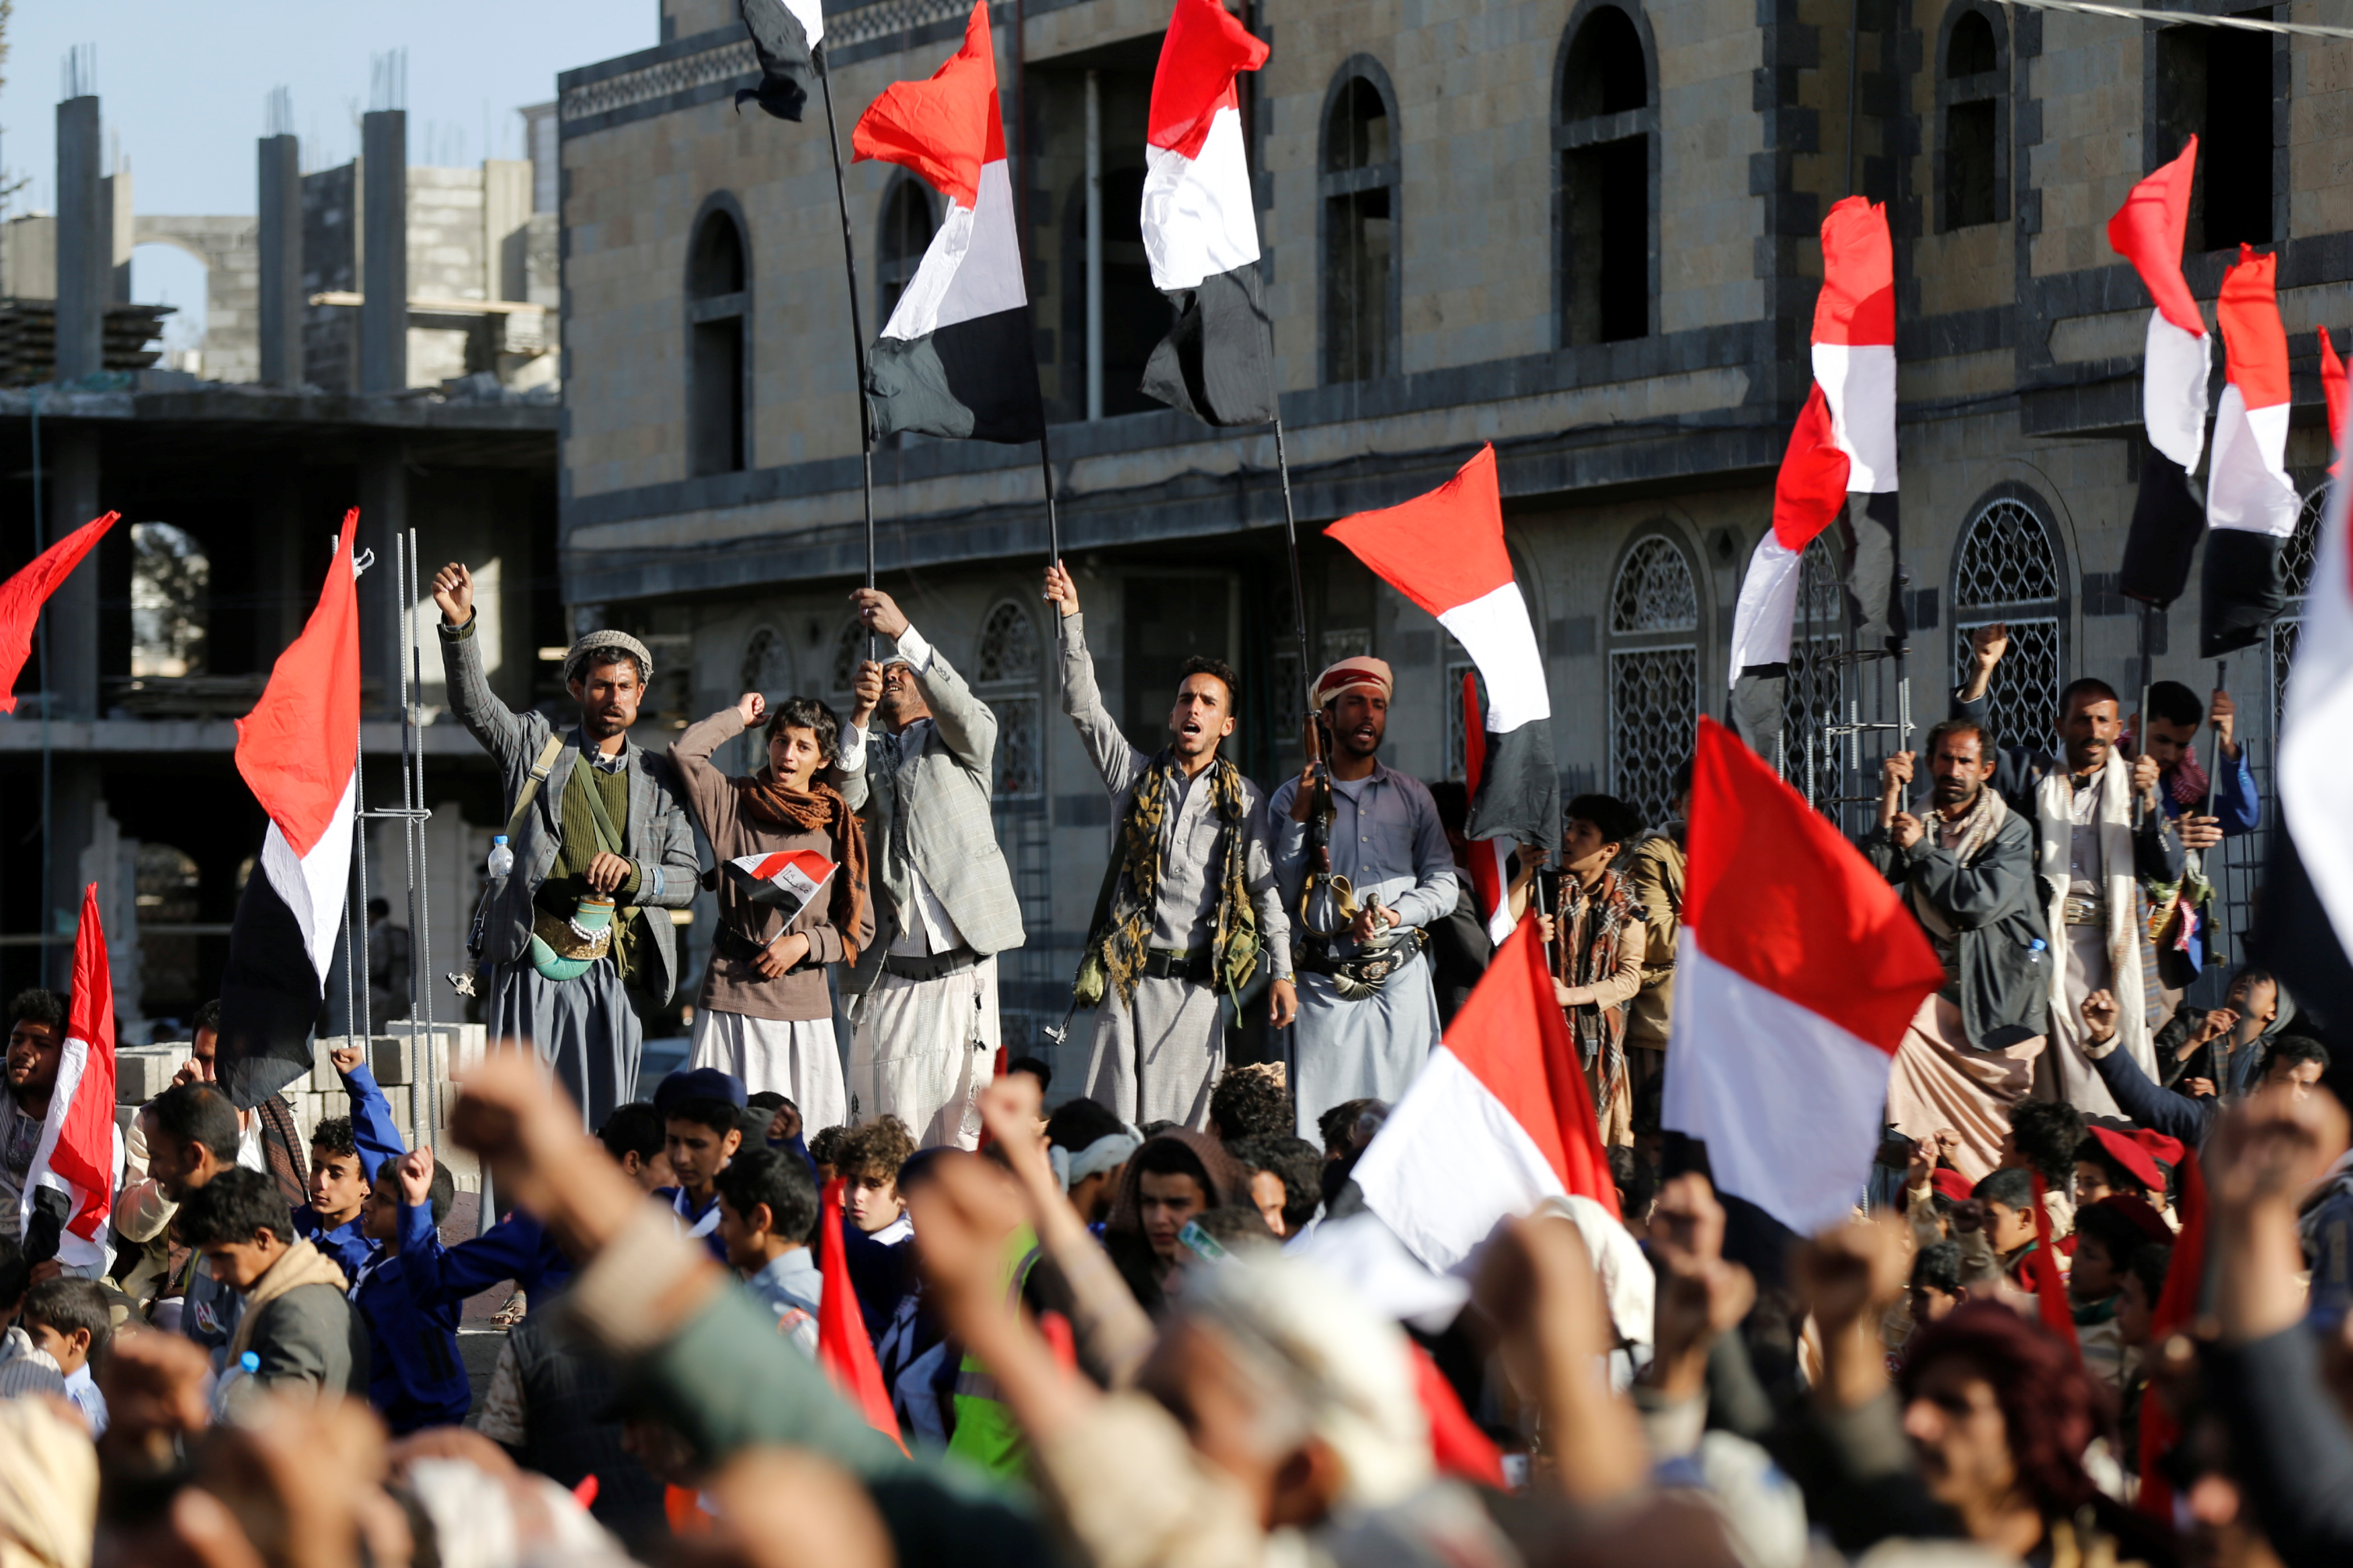 Houthi followers rally to celebrate the killing of Yemen's former president Ali Abdullah Saleh in Sanaa, Yemen December 5, 2017. REUTERS/Khaled Abdullah - RC14B0A132D0